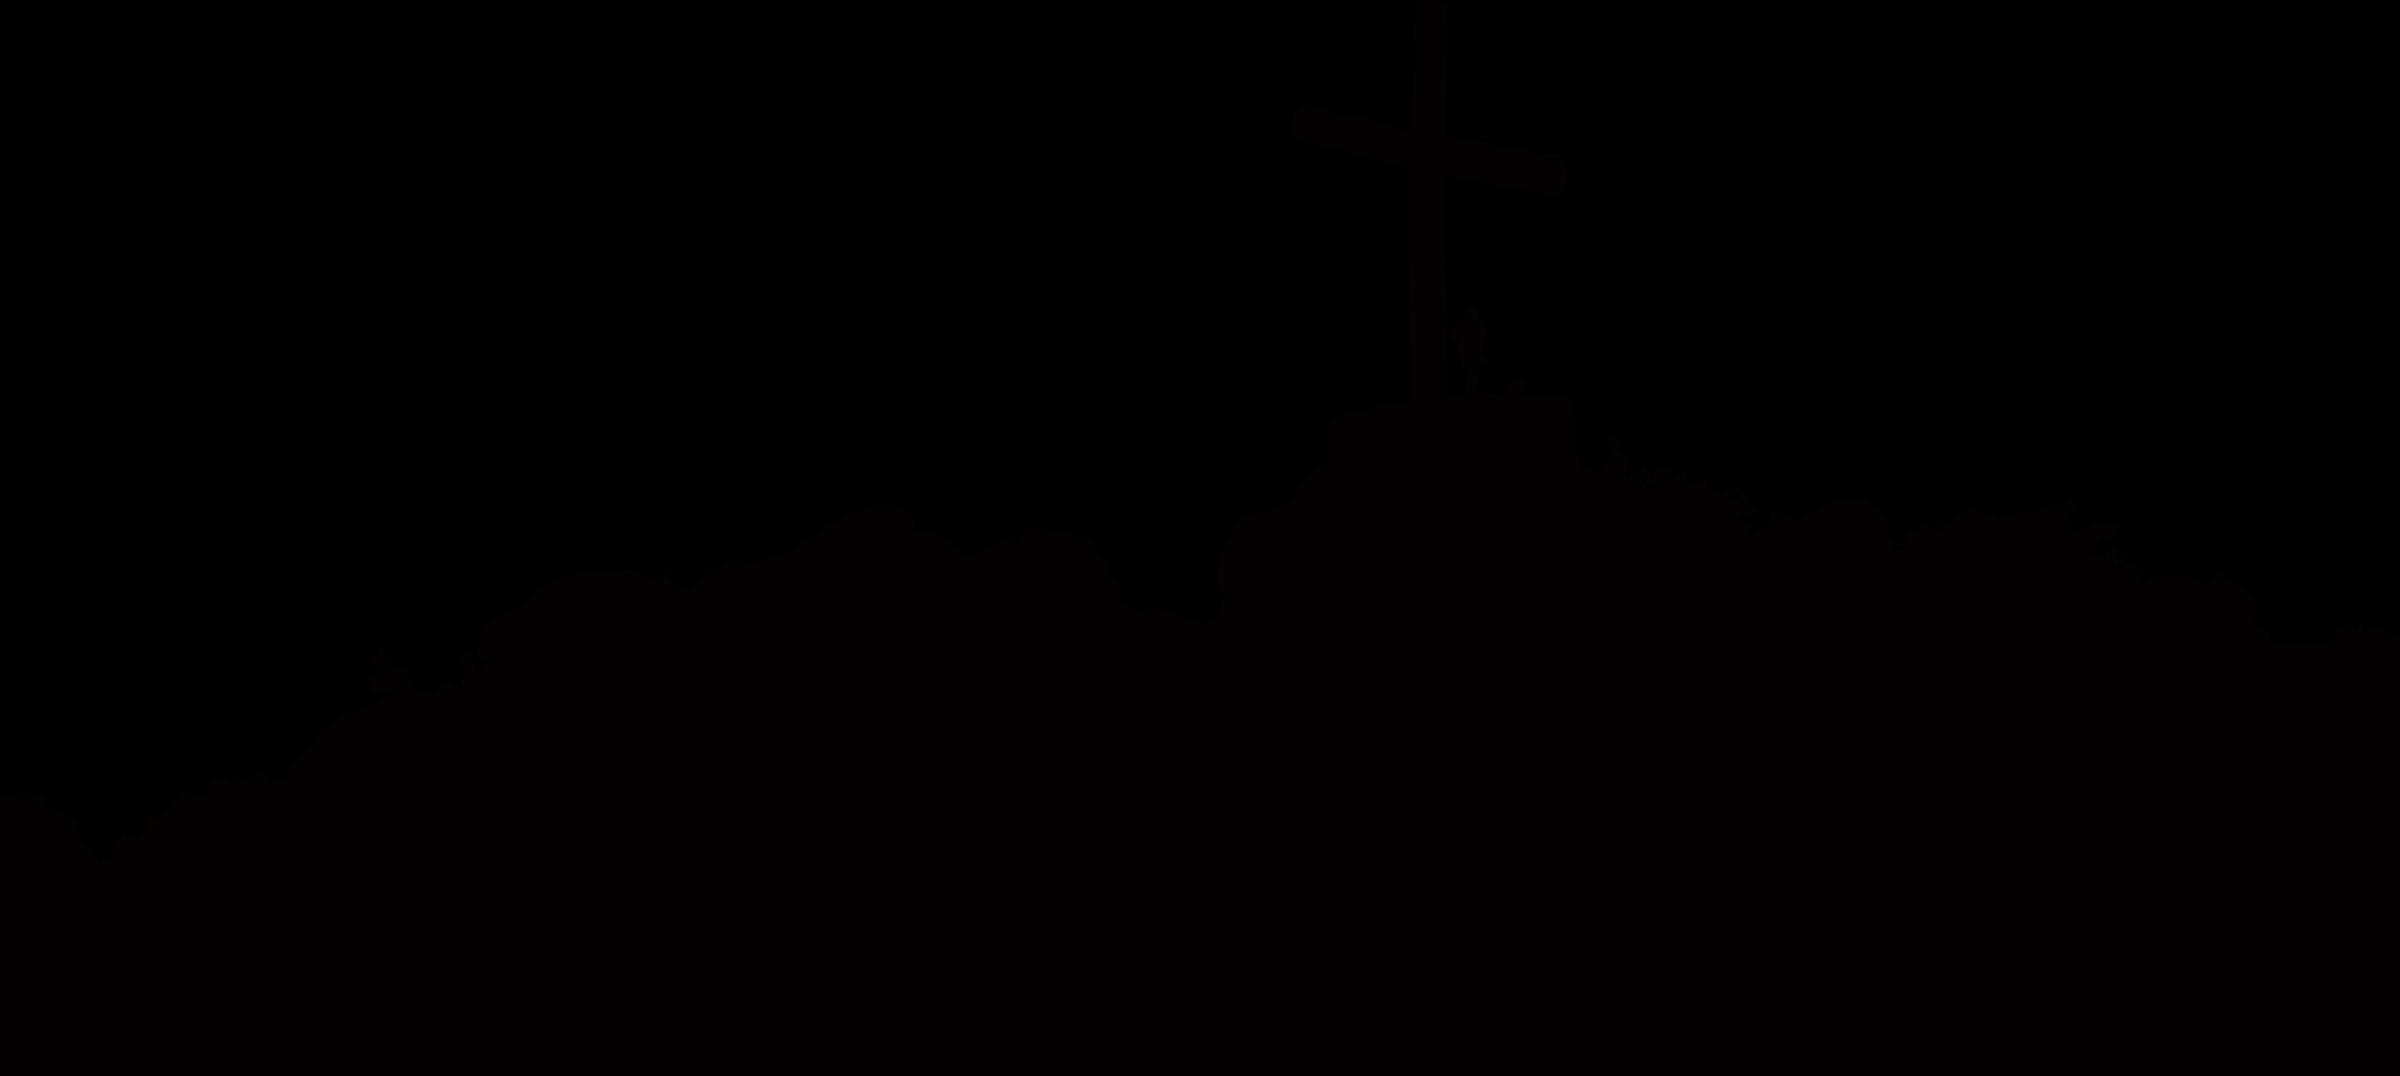 Clipart farm sunrise. Cross silhouette at getdrawings